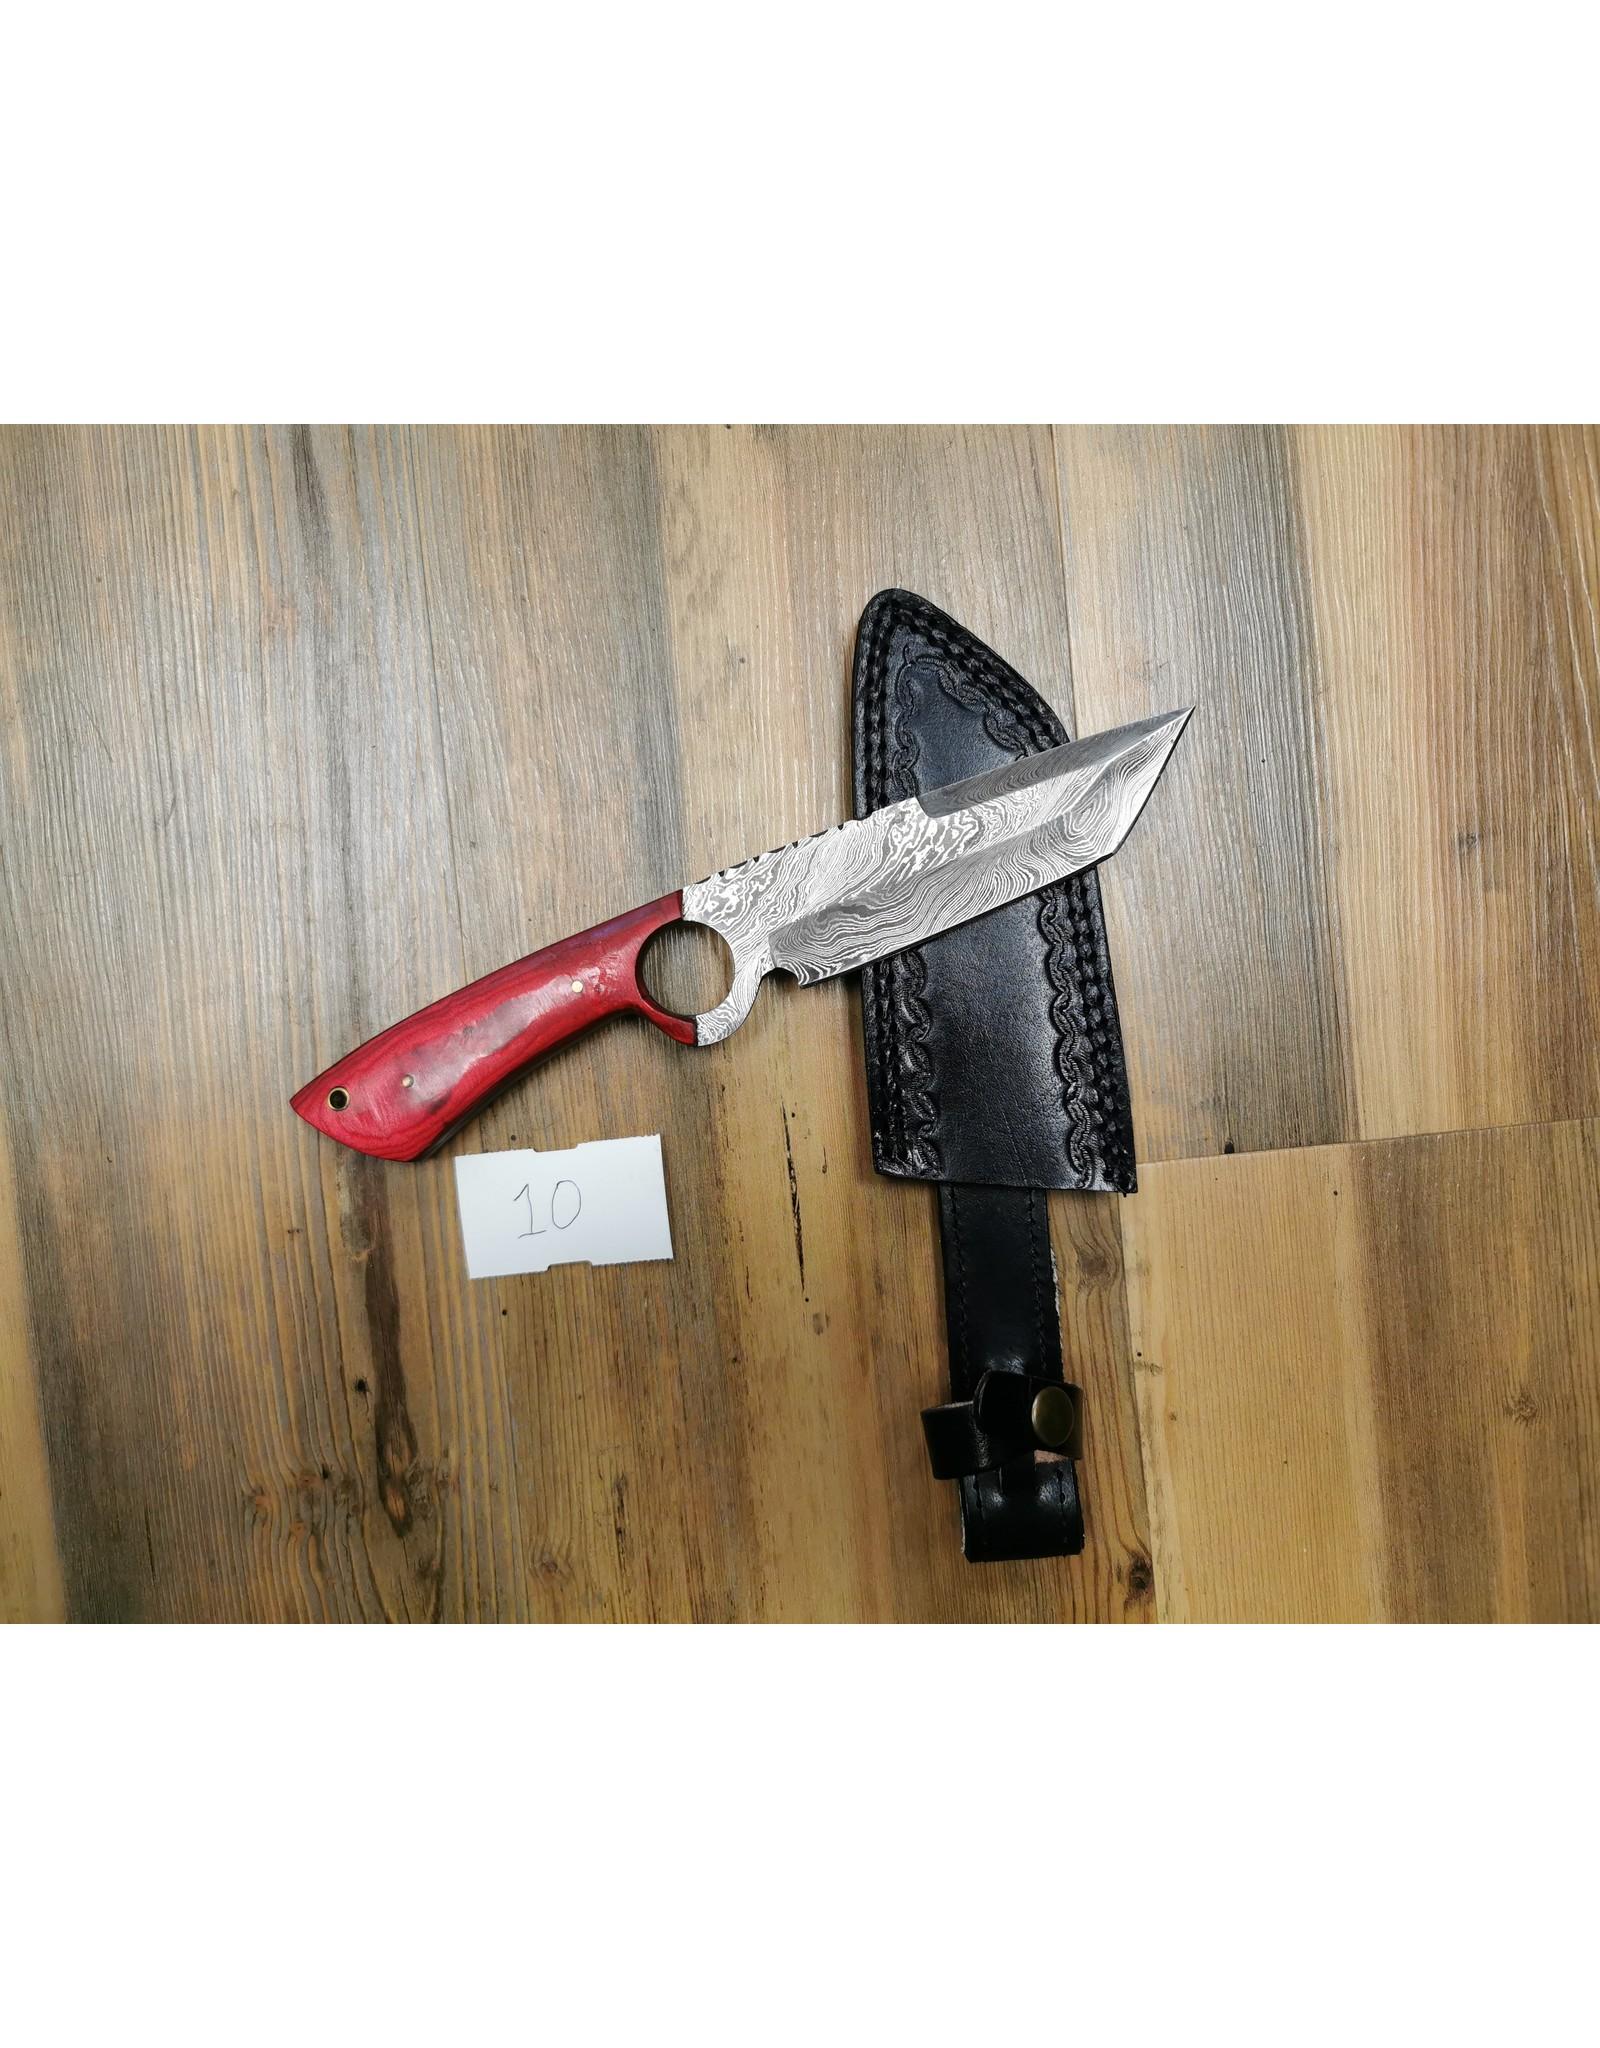 BAJWA ENTERPRISES DAMASCUS TANTO KNIFE #10